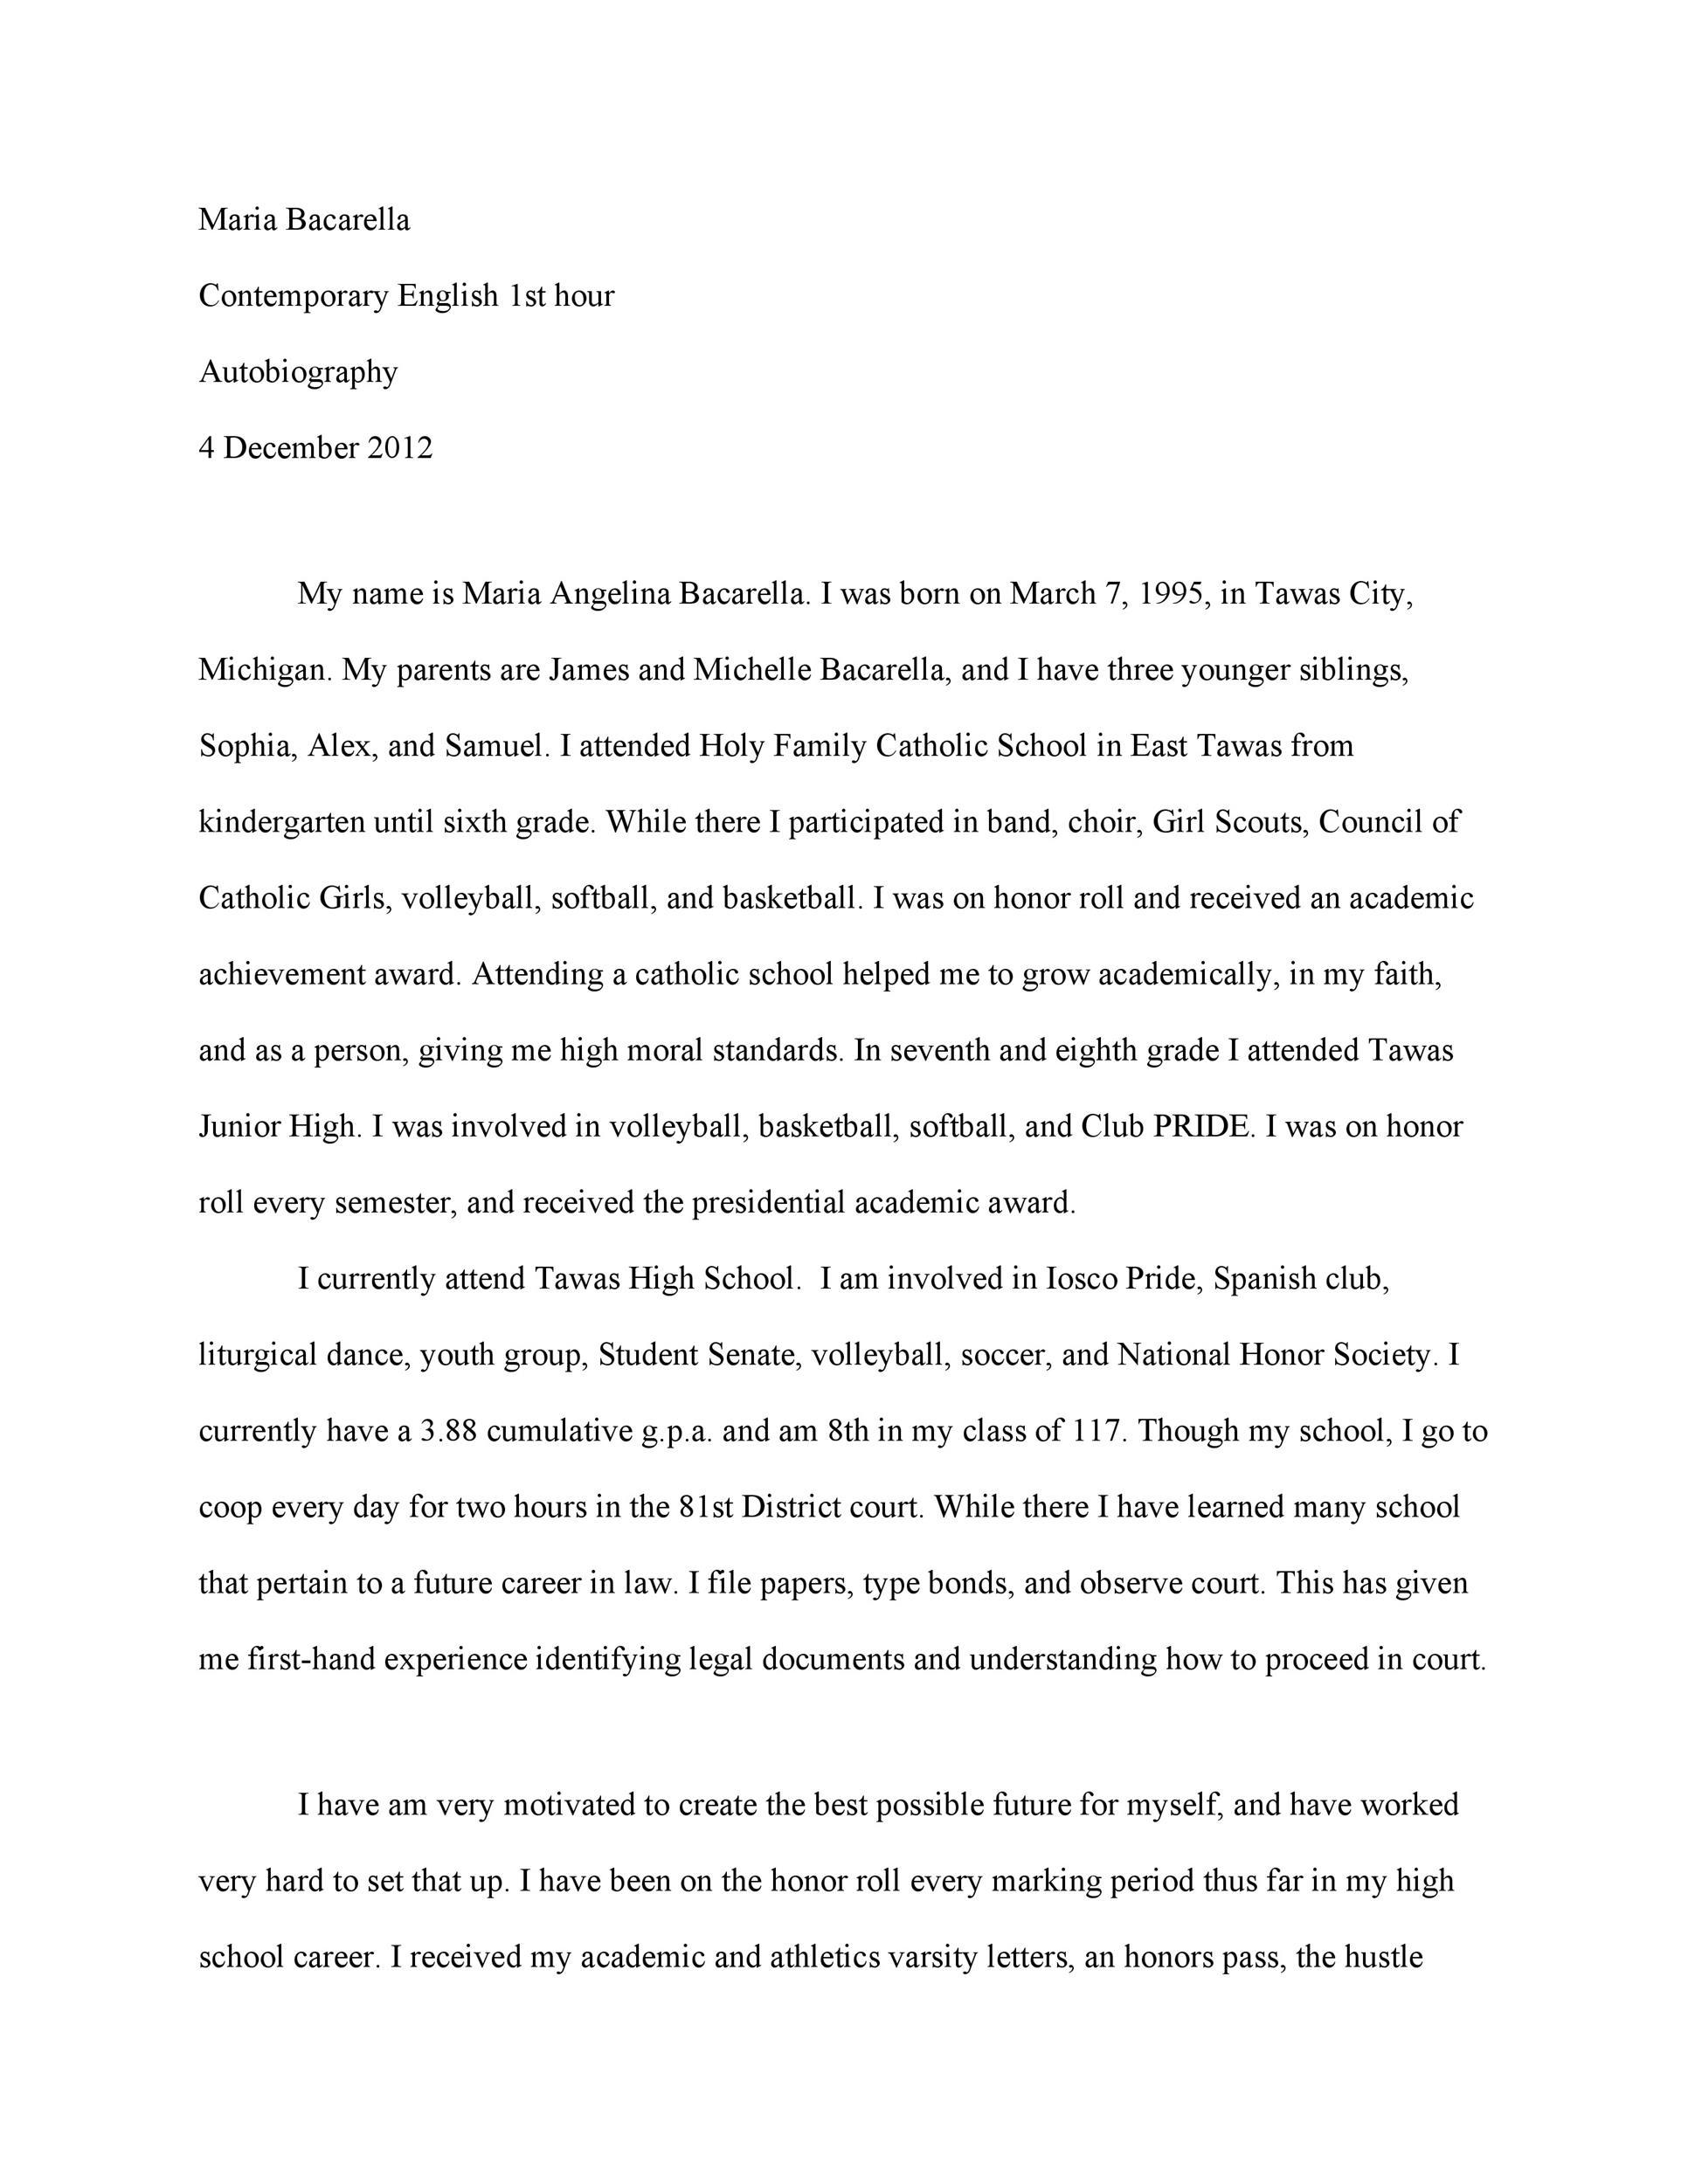 Autobiography Example Essay Ixujezyso